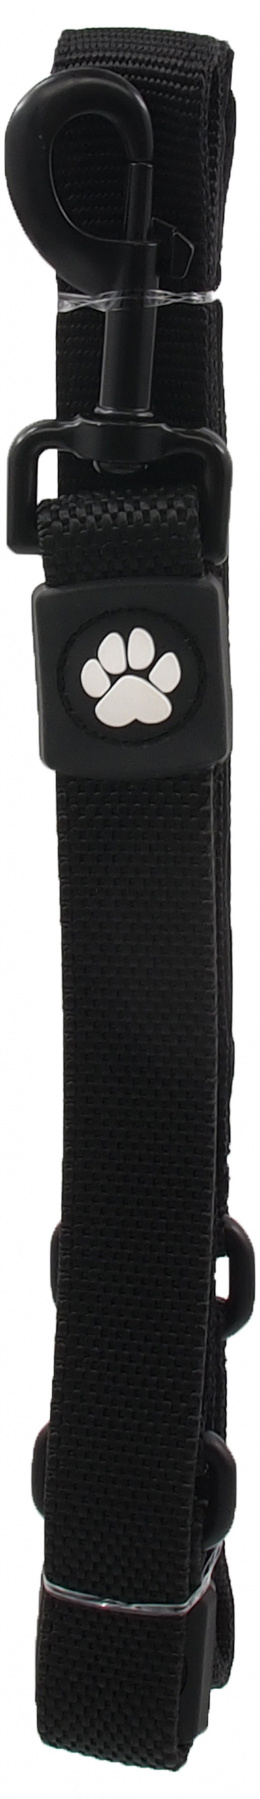 Vodítko Active Dog Bungee Neoprene L černé 2,5x120cm